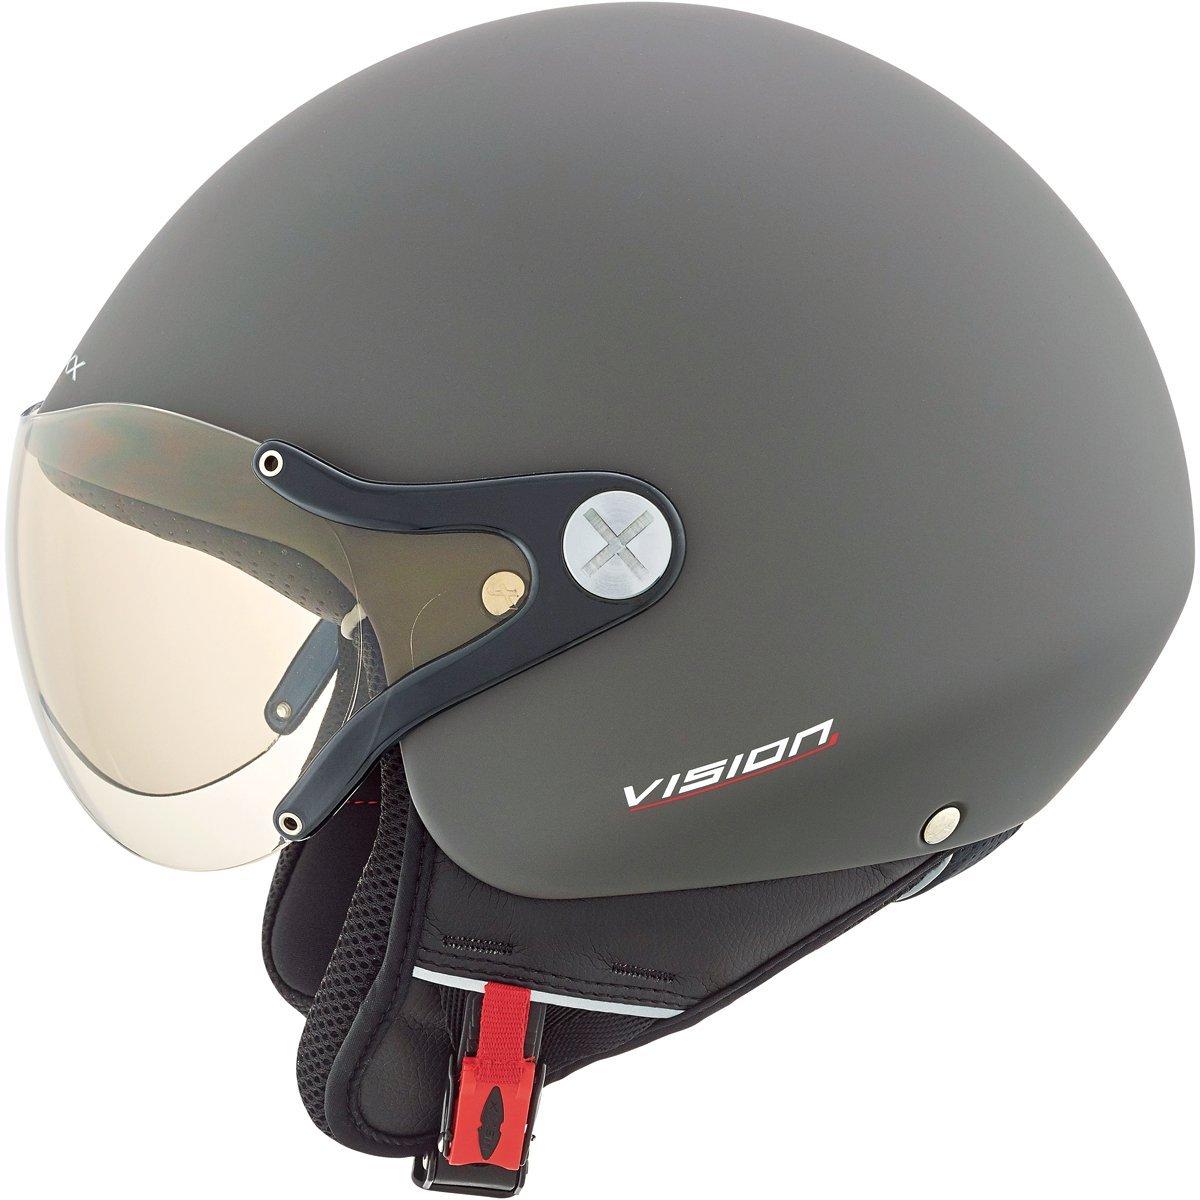 601c3869 Motorcycle Nexx X60 Vision Plus Helmet Anthracite XL: Nexx Helmets:  Amazon.co.uk: Car & Motorbike